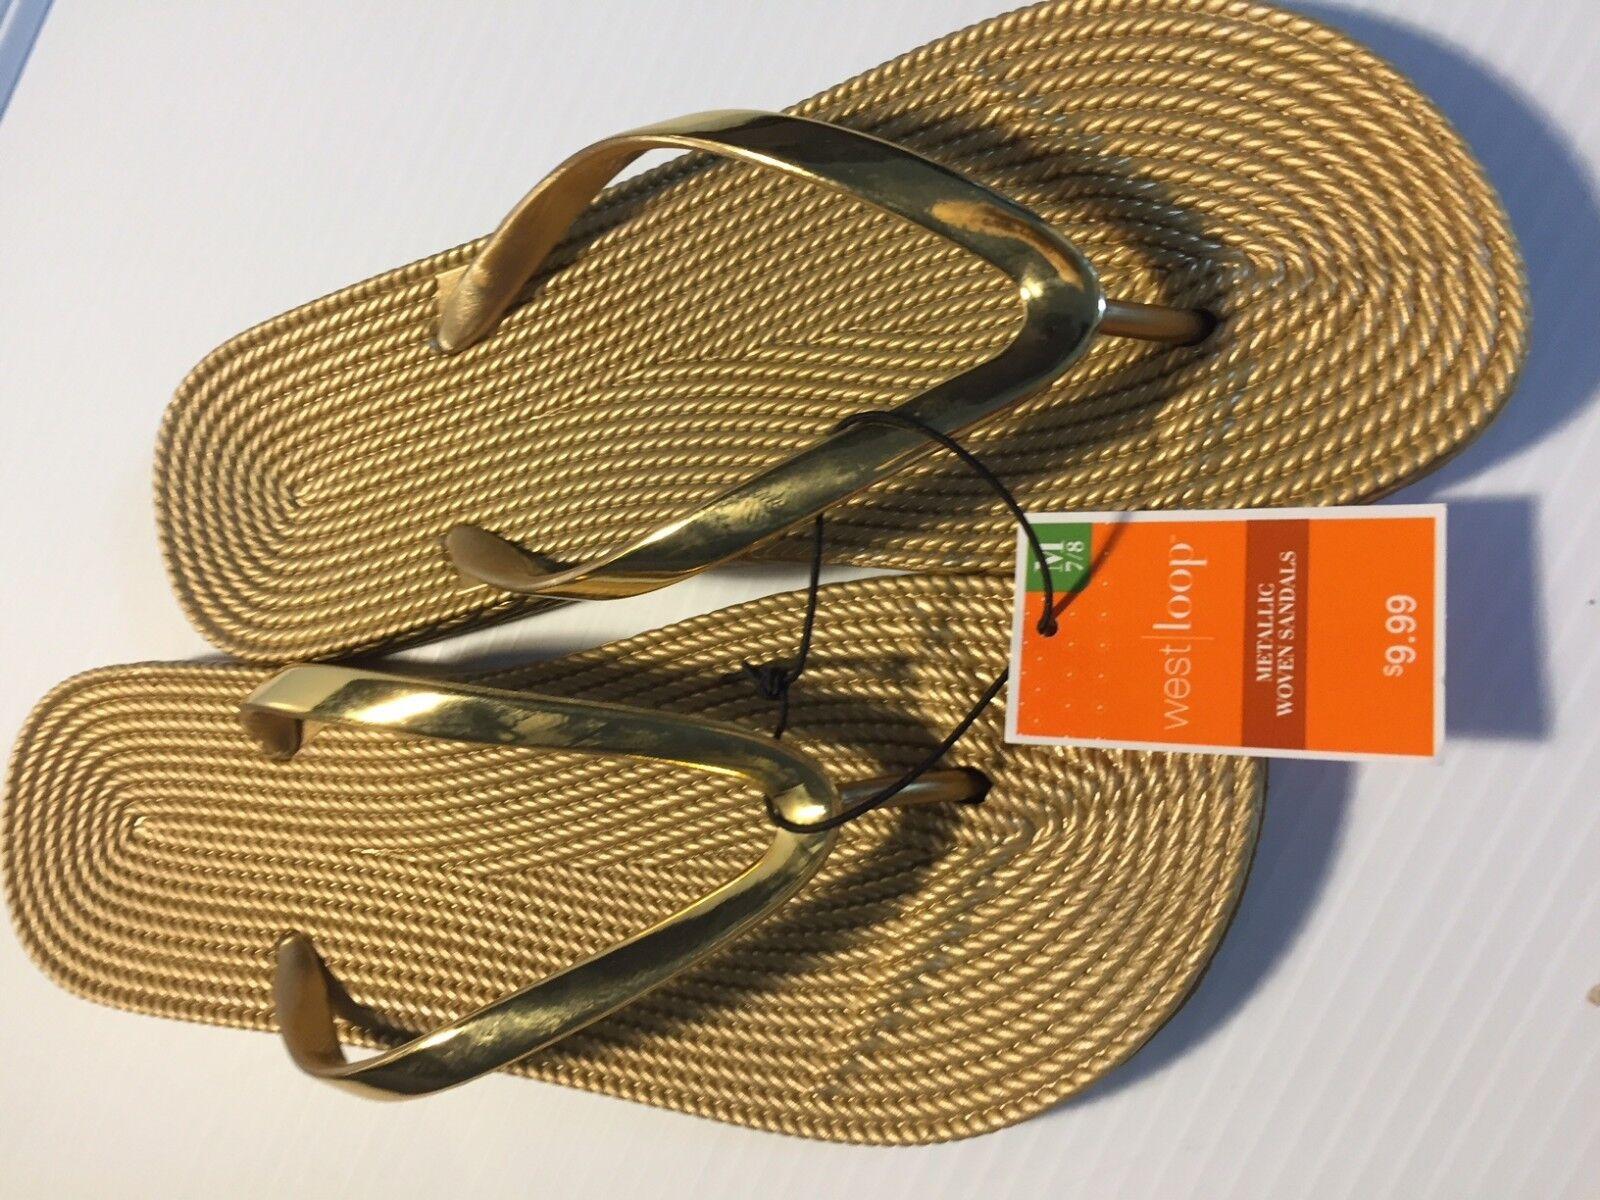 West Medium Loop Metallic Woven Sandals Women Gold Color Medium West Size 7 / 8 238296